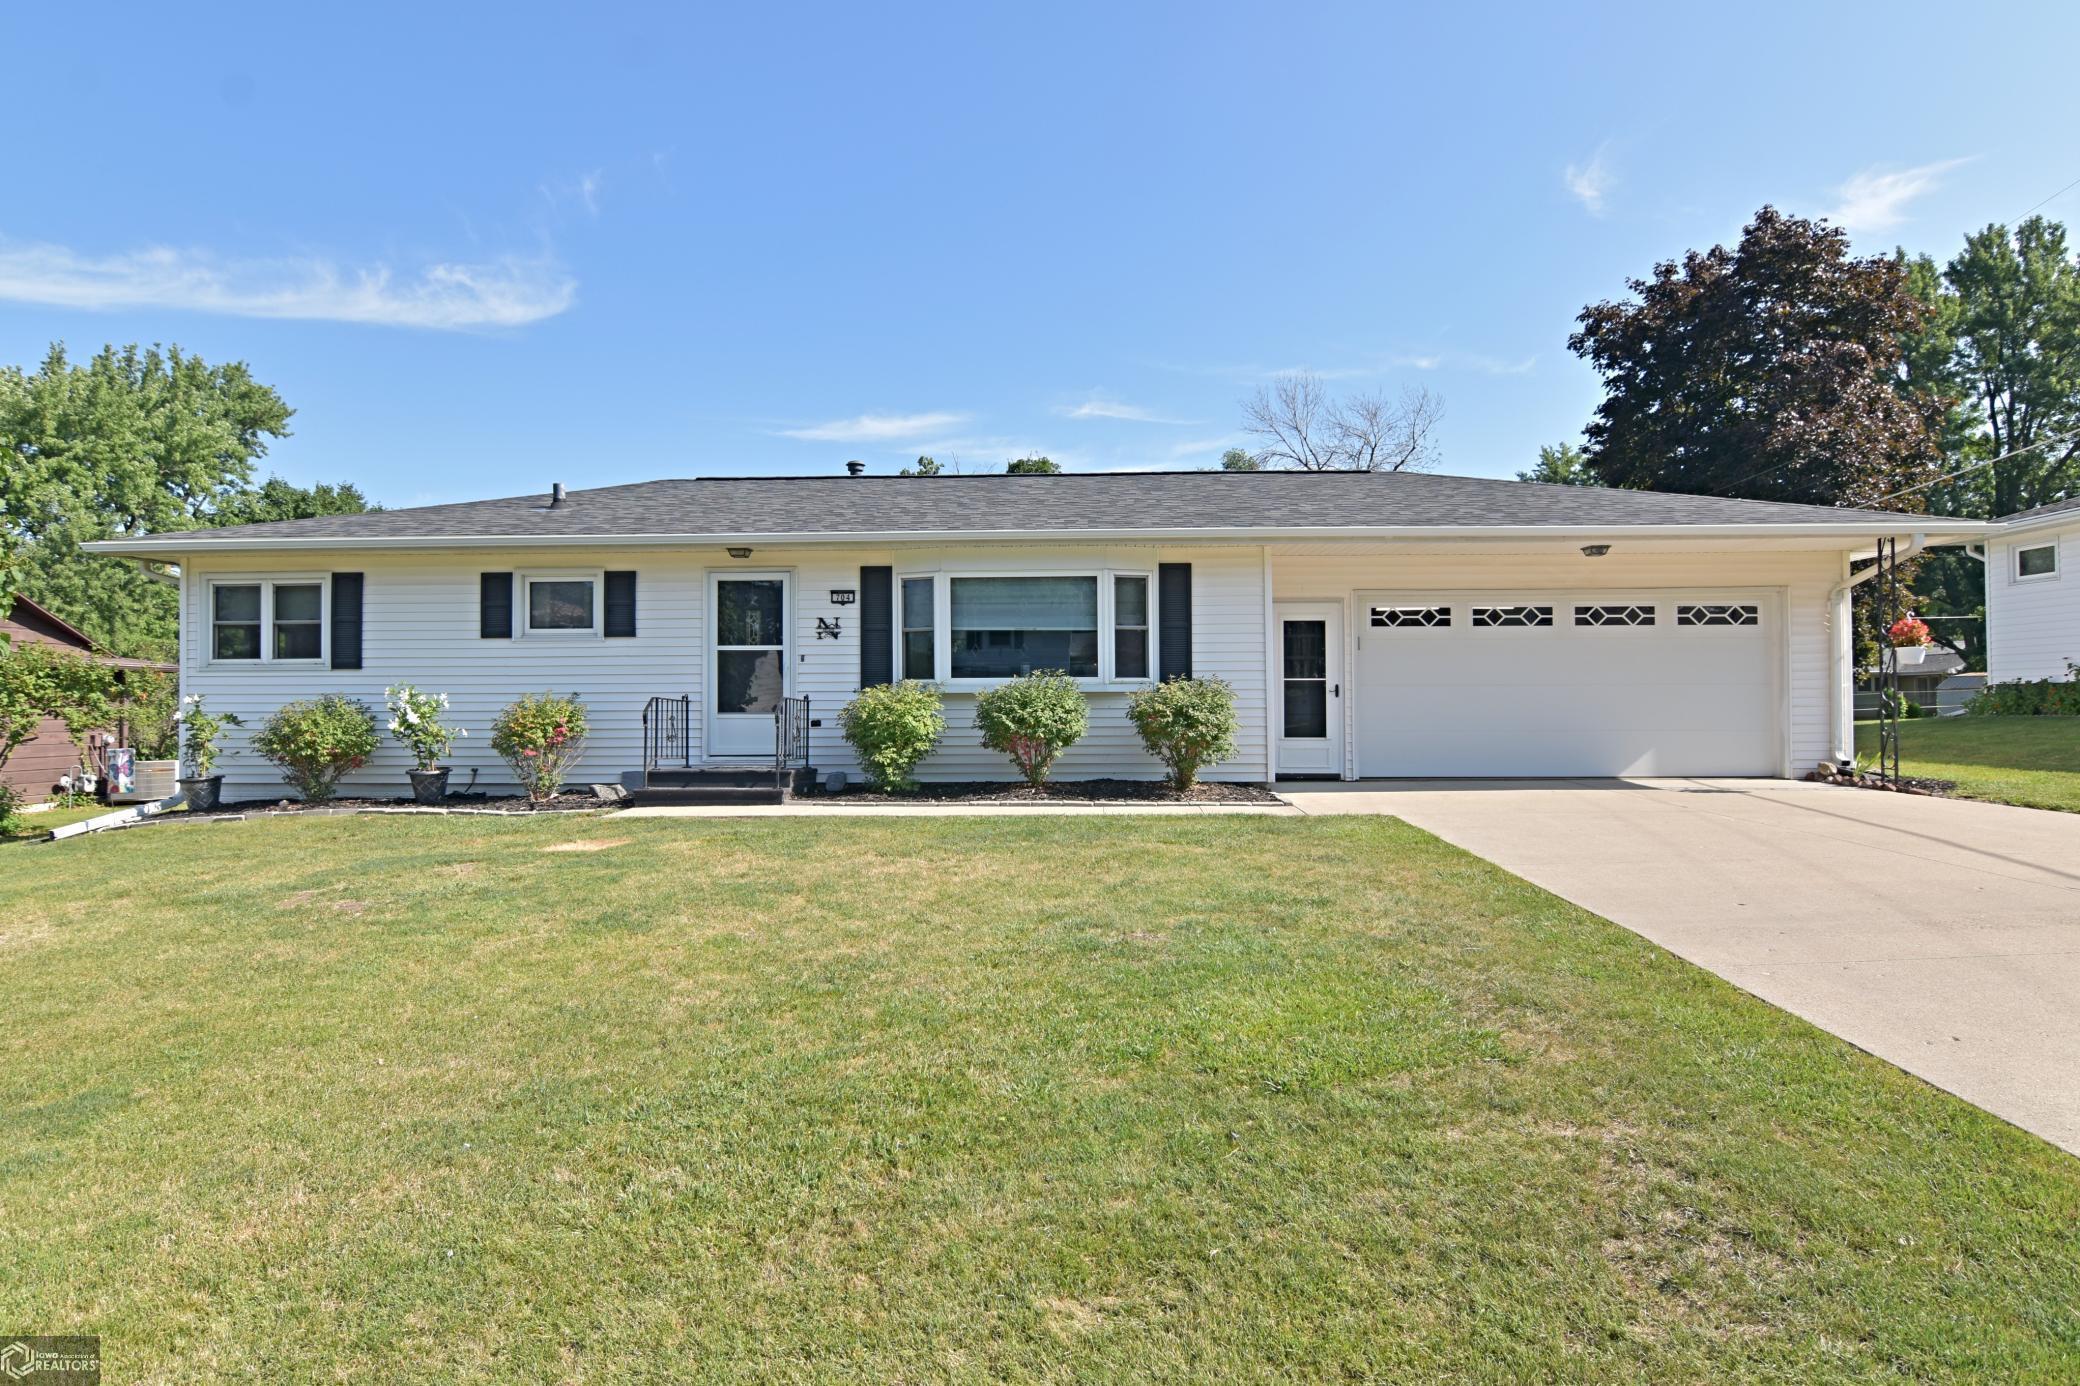 704 Ratcliffe Property Photo - Marshalltown, IA real estate listing